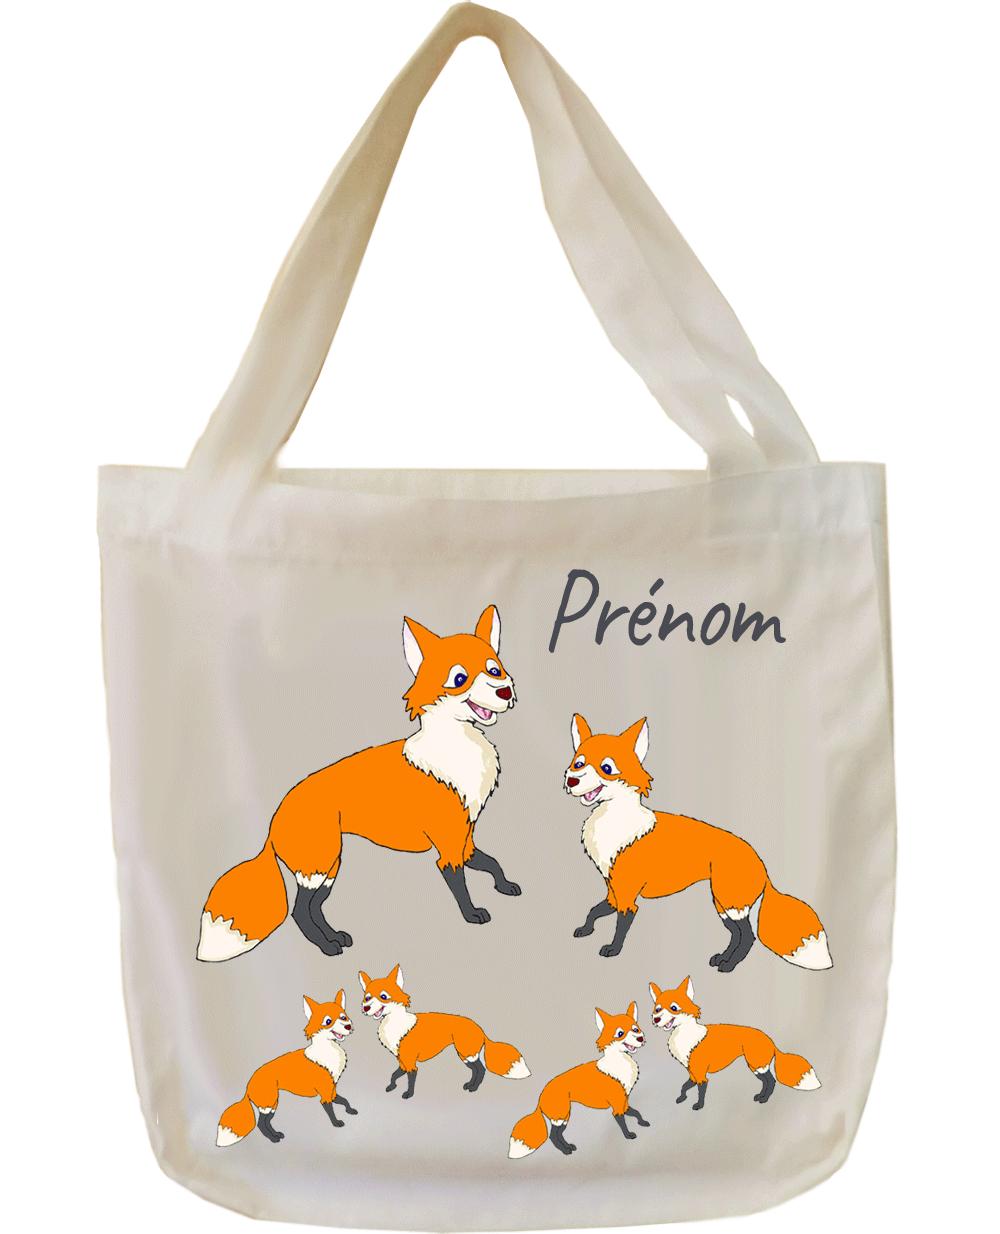 tote-bag;sac;cabas;texti;cadeaux;personnalisable;personnalisation;personnalise;prenom;animal;renard